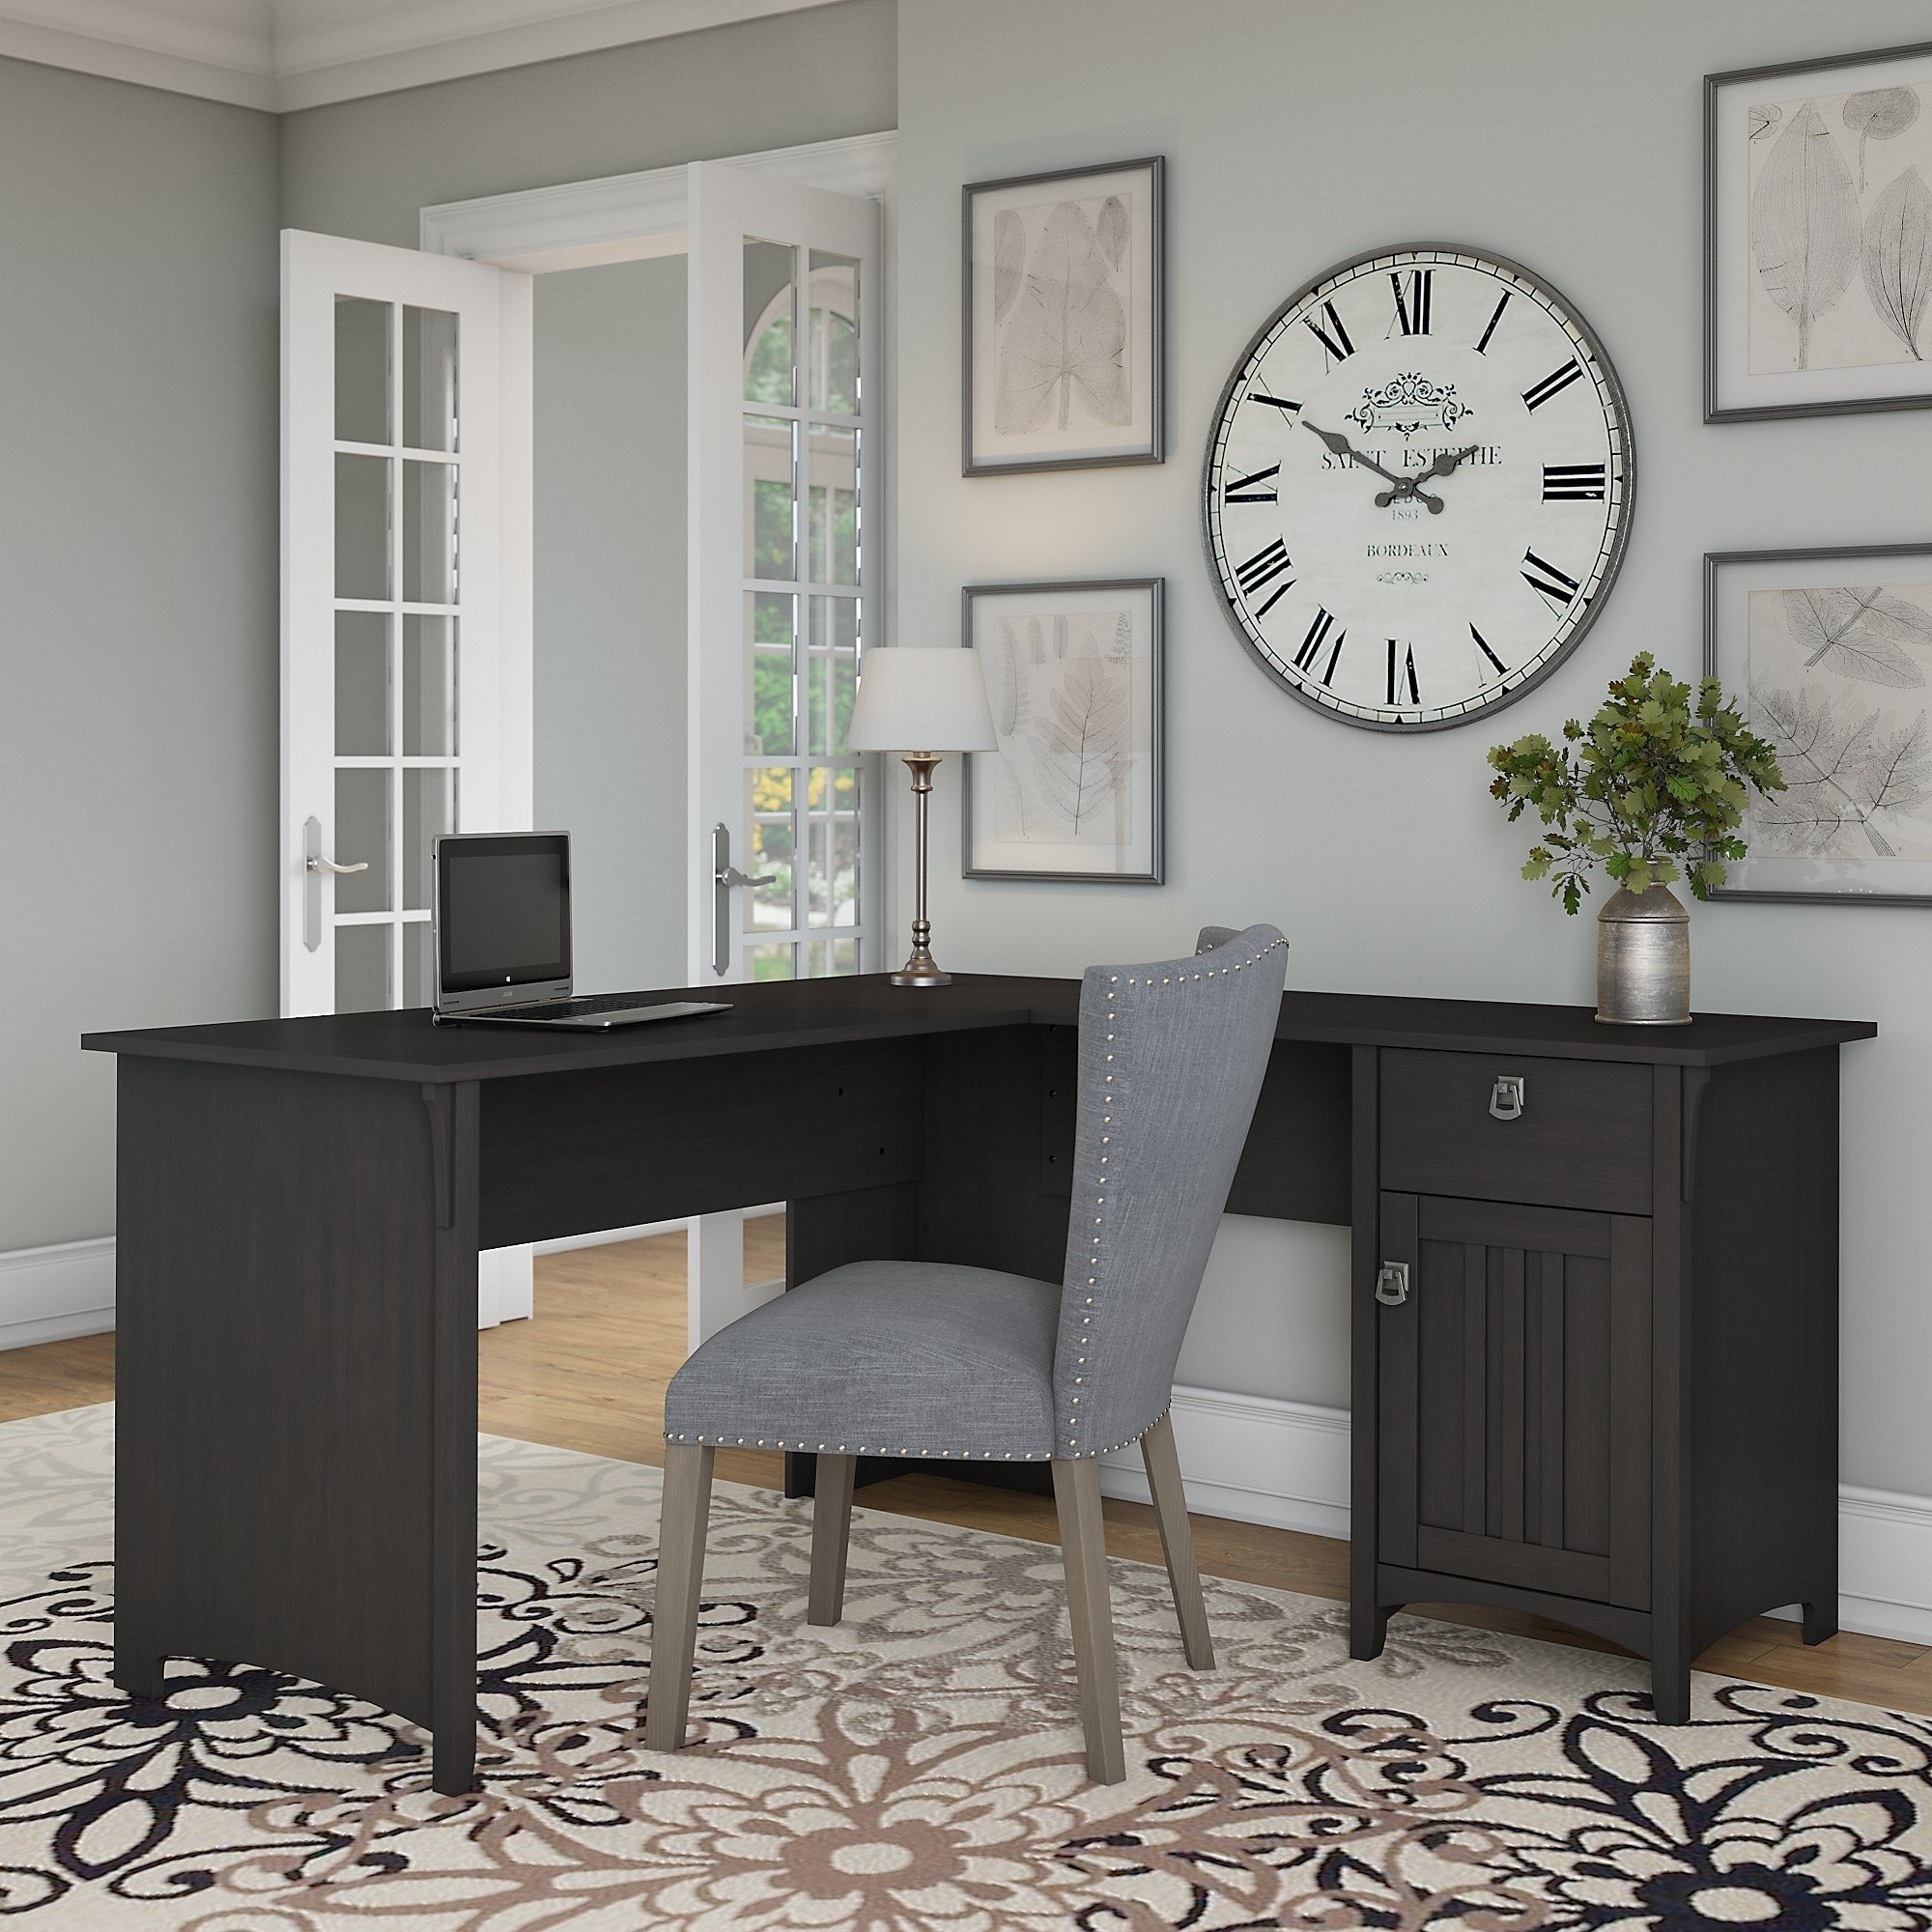 The Gray Barn Lowbridge L Shaped Desk With Storage In Vintage Black With Images L Shaped Corner Desk Home Office Furniture Home Office Design